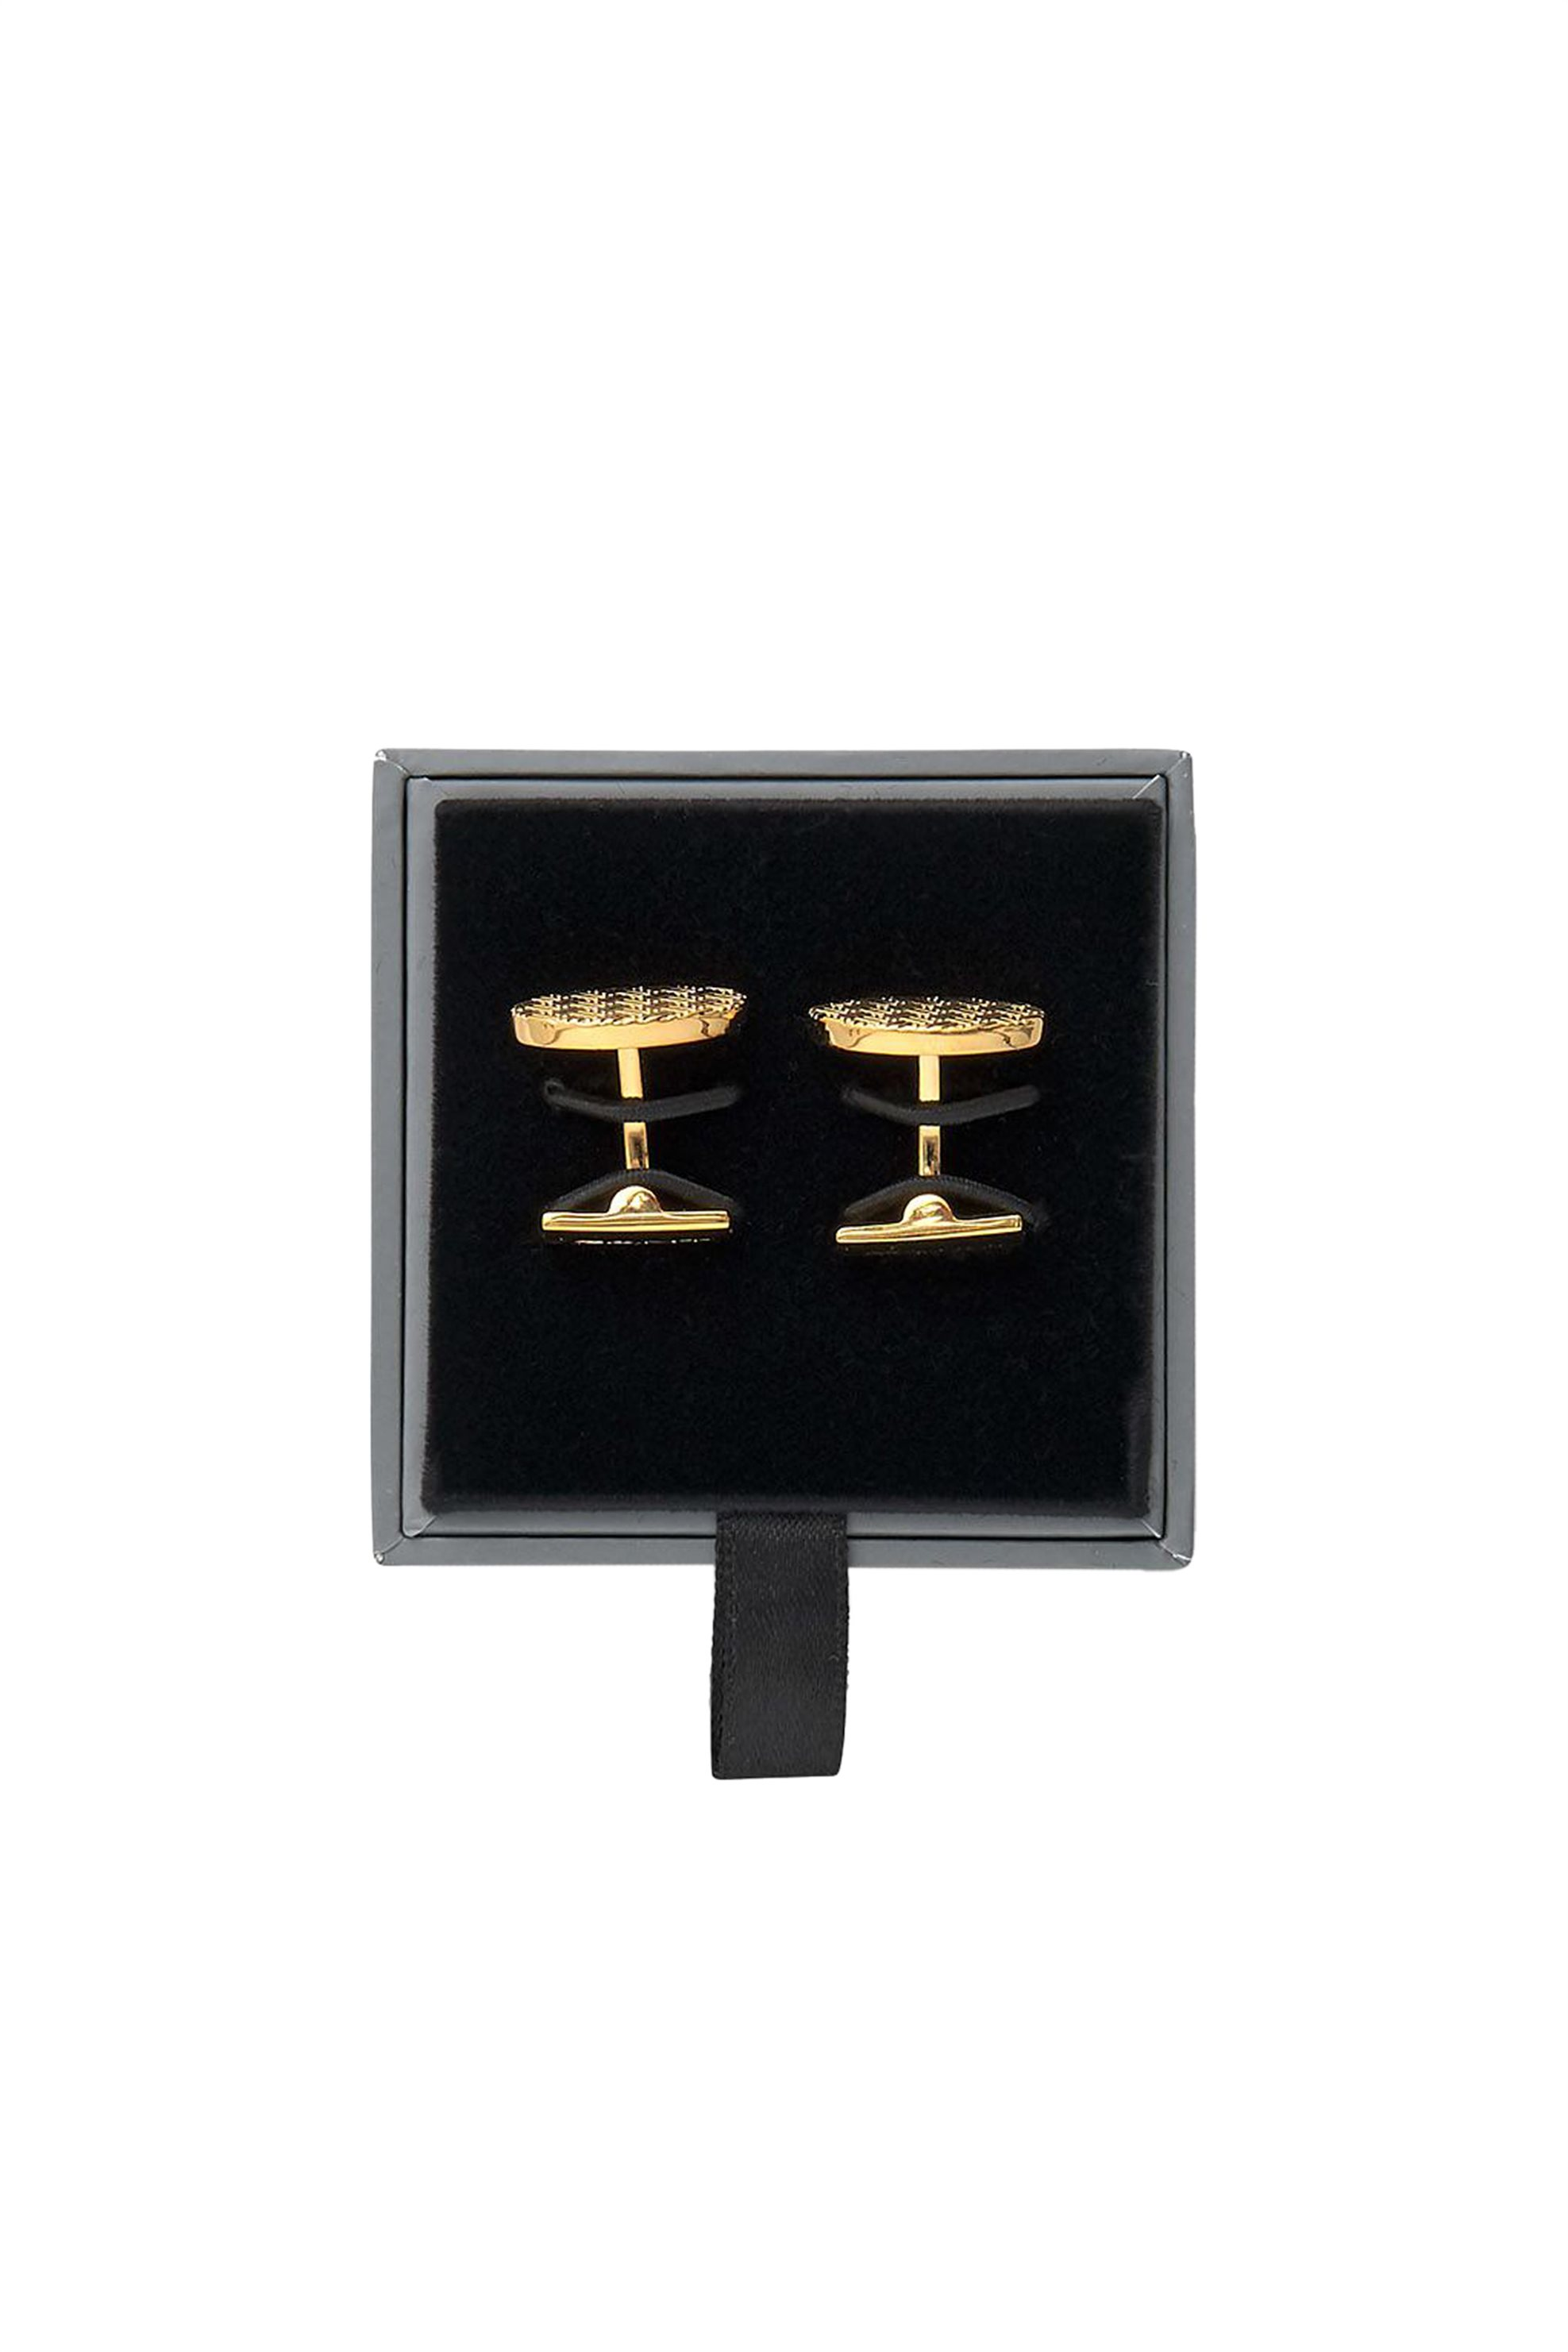 Gant ανδρικά μανικετόκουμπα στρογγυλά - 9990007 - Χρυσό ανδρασ   αξεσουαρ   μανικετόκουμπα